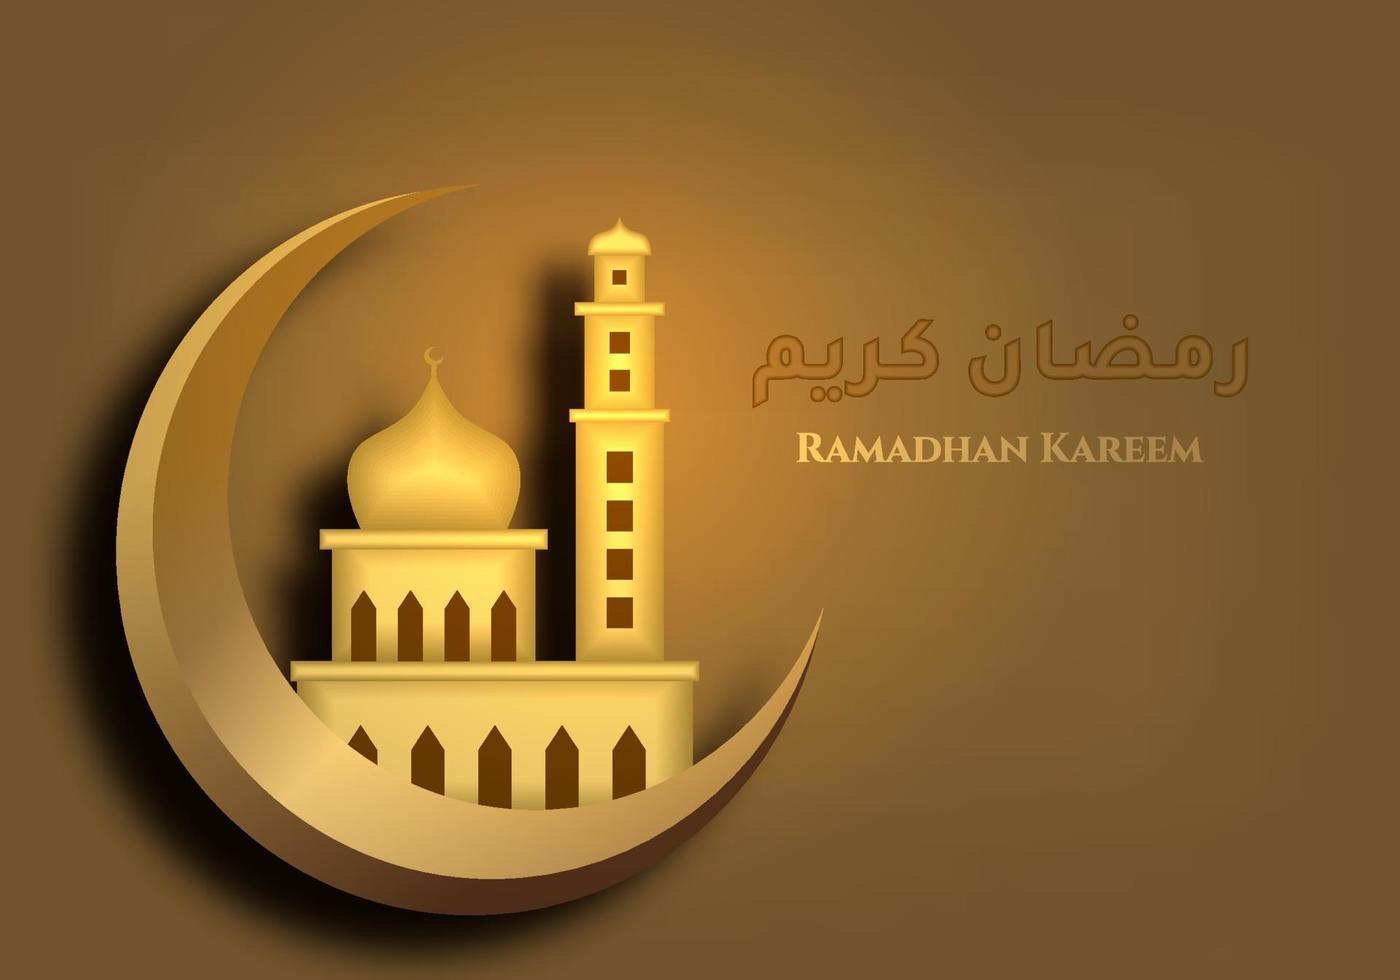 Ramadan Kareem Background With Mosque In Crescent Moon Gold Luxurious Template Ornate Element Happy Eid Fitr Eid Mubarak Islamic Motif In Gold Color Flat Cartoon Design Vector Illustration 2214326 Vector Art At